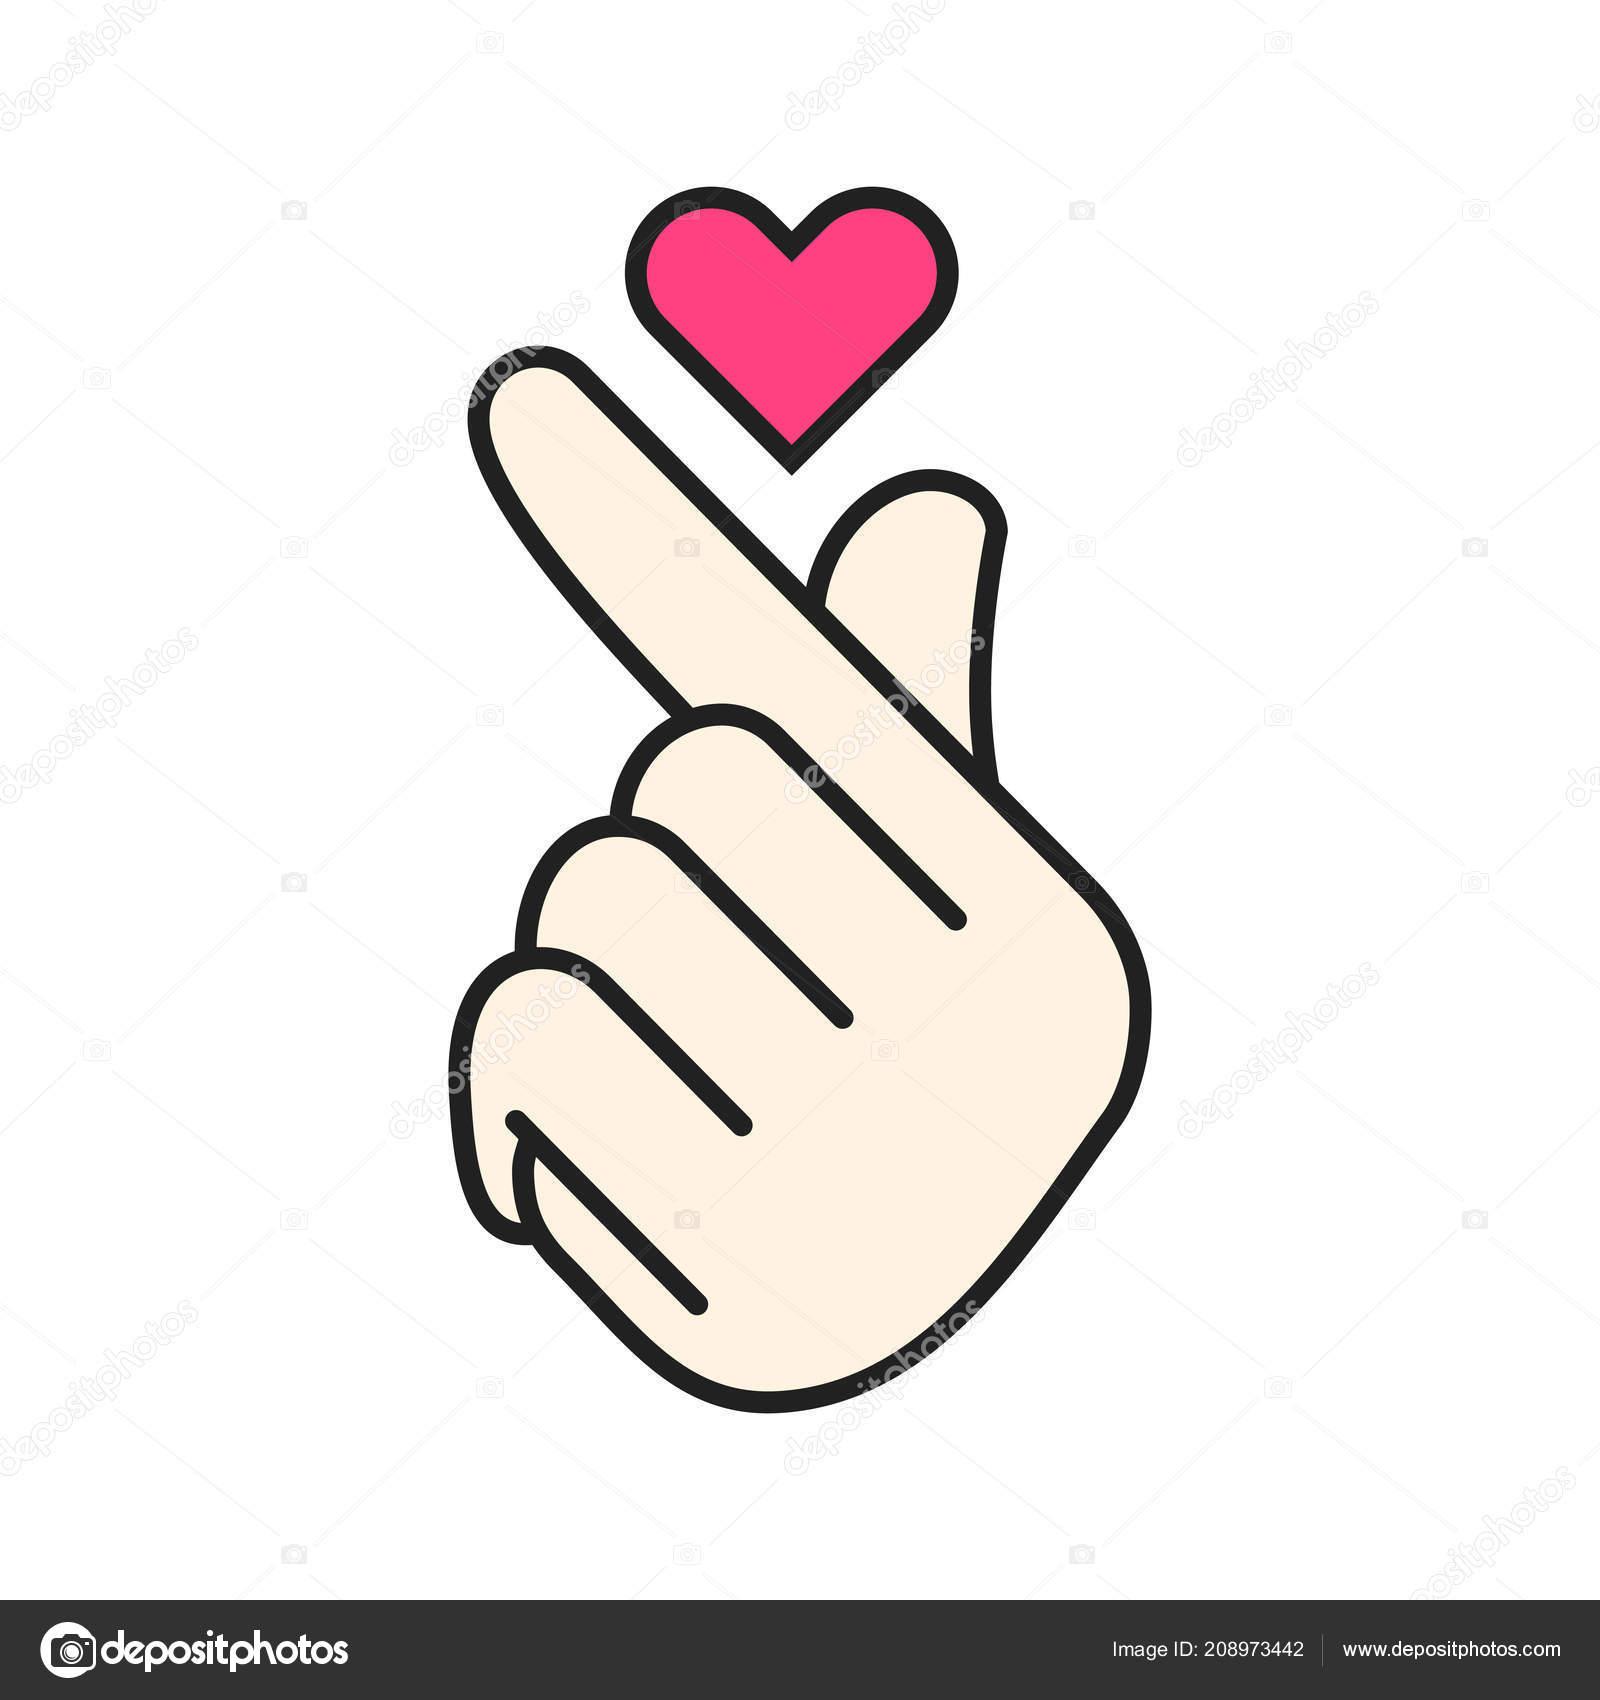 hand hearts korean - HD1024×1024